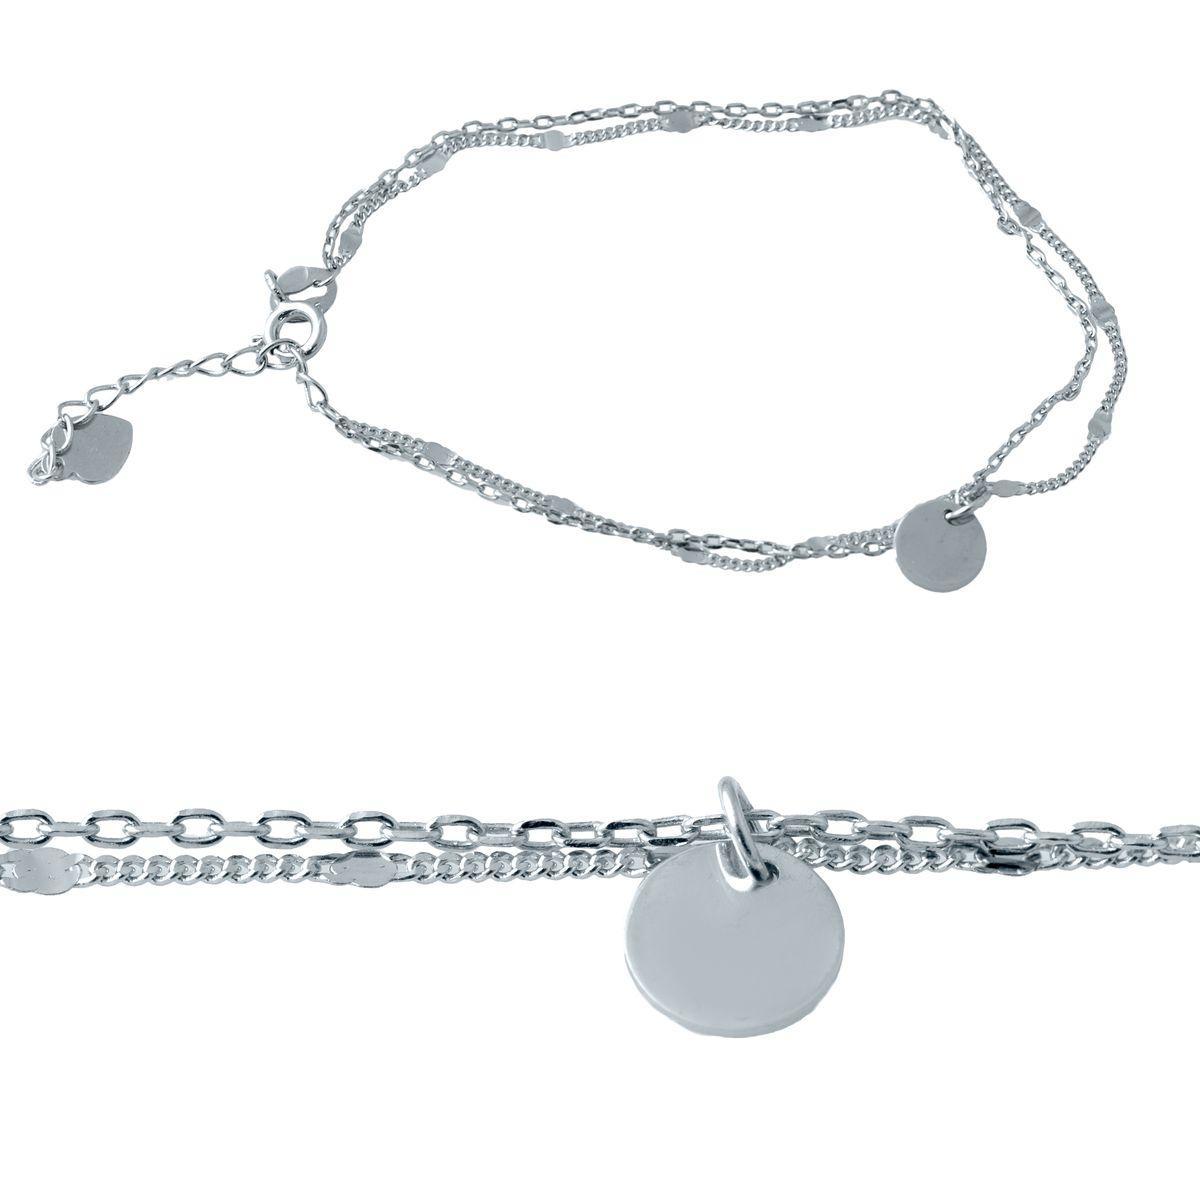 Серебряный браслет DreamJewelry без камней (2022268) 1720 размер